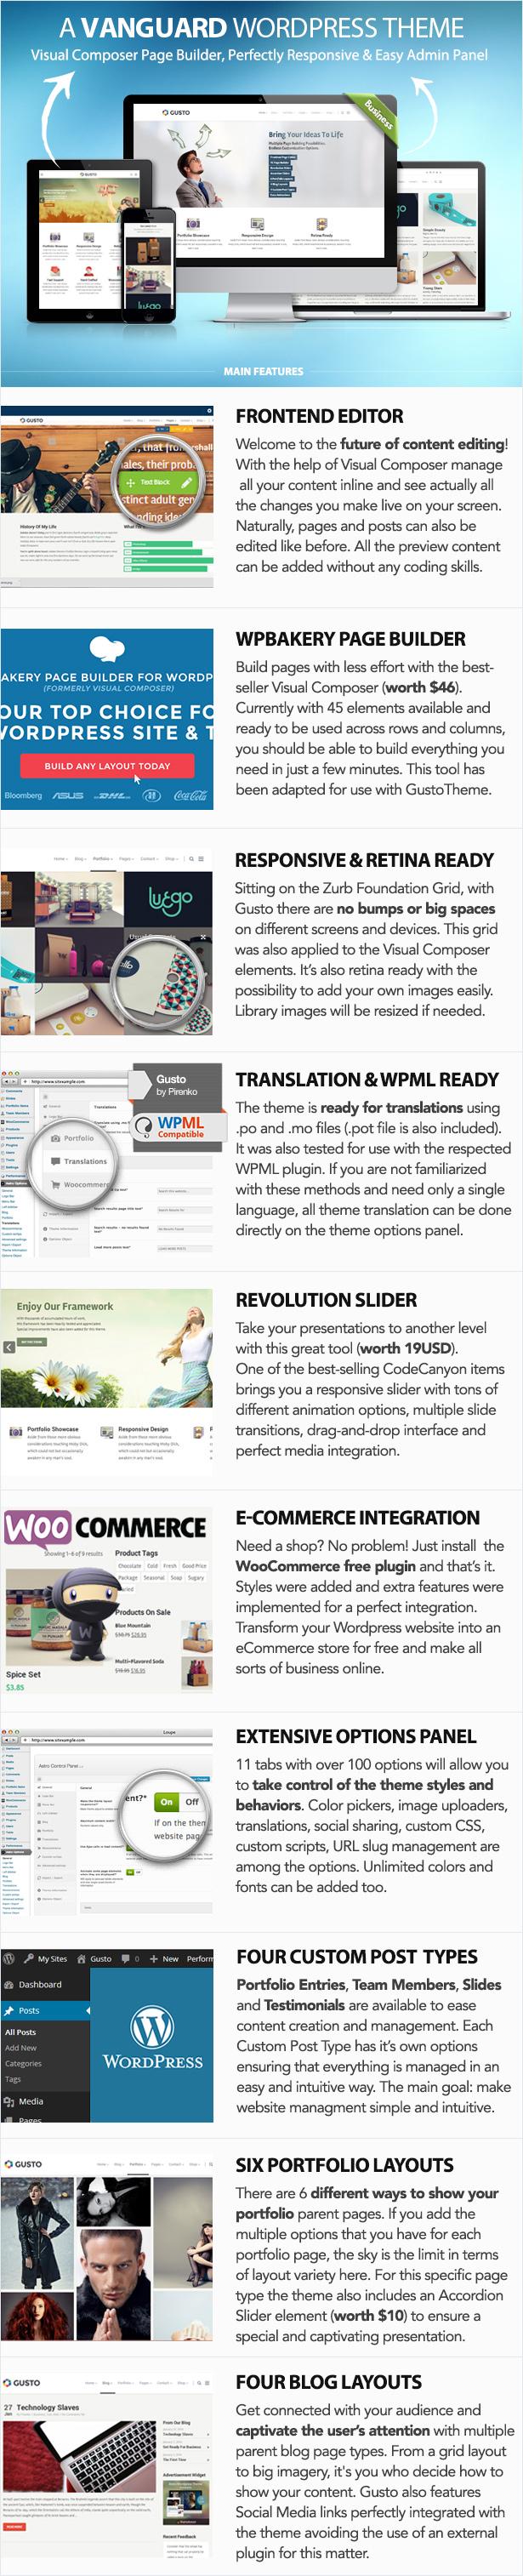 Gusto - Vanguard WordPress Theme - 2